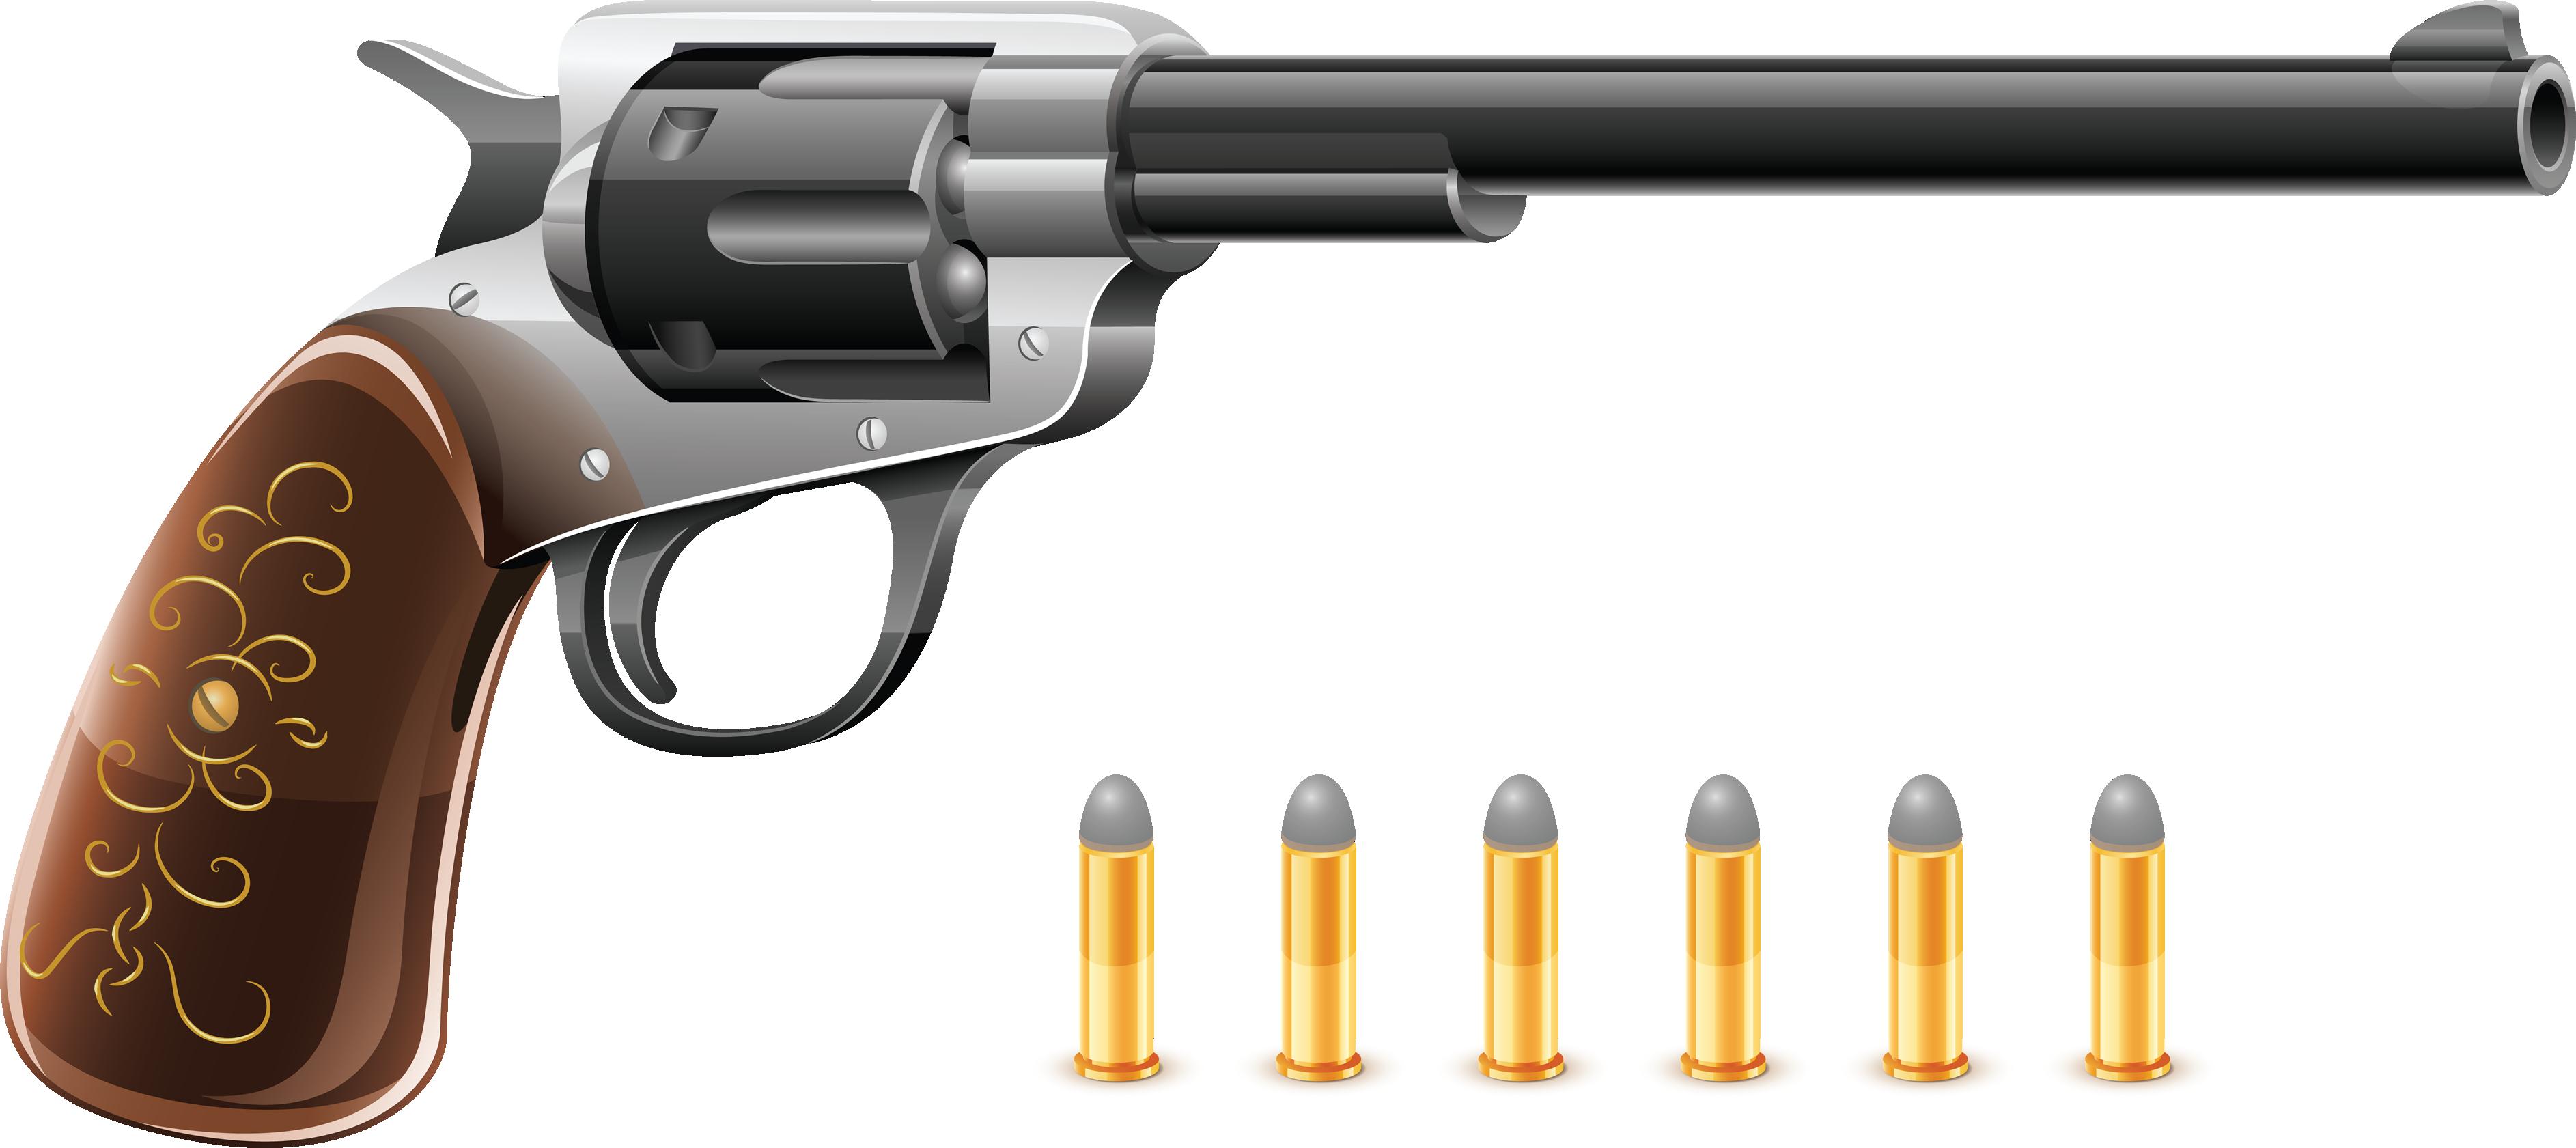 Gun Png image #40752 - Gun PNG